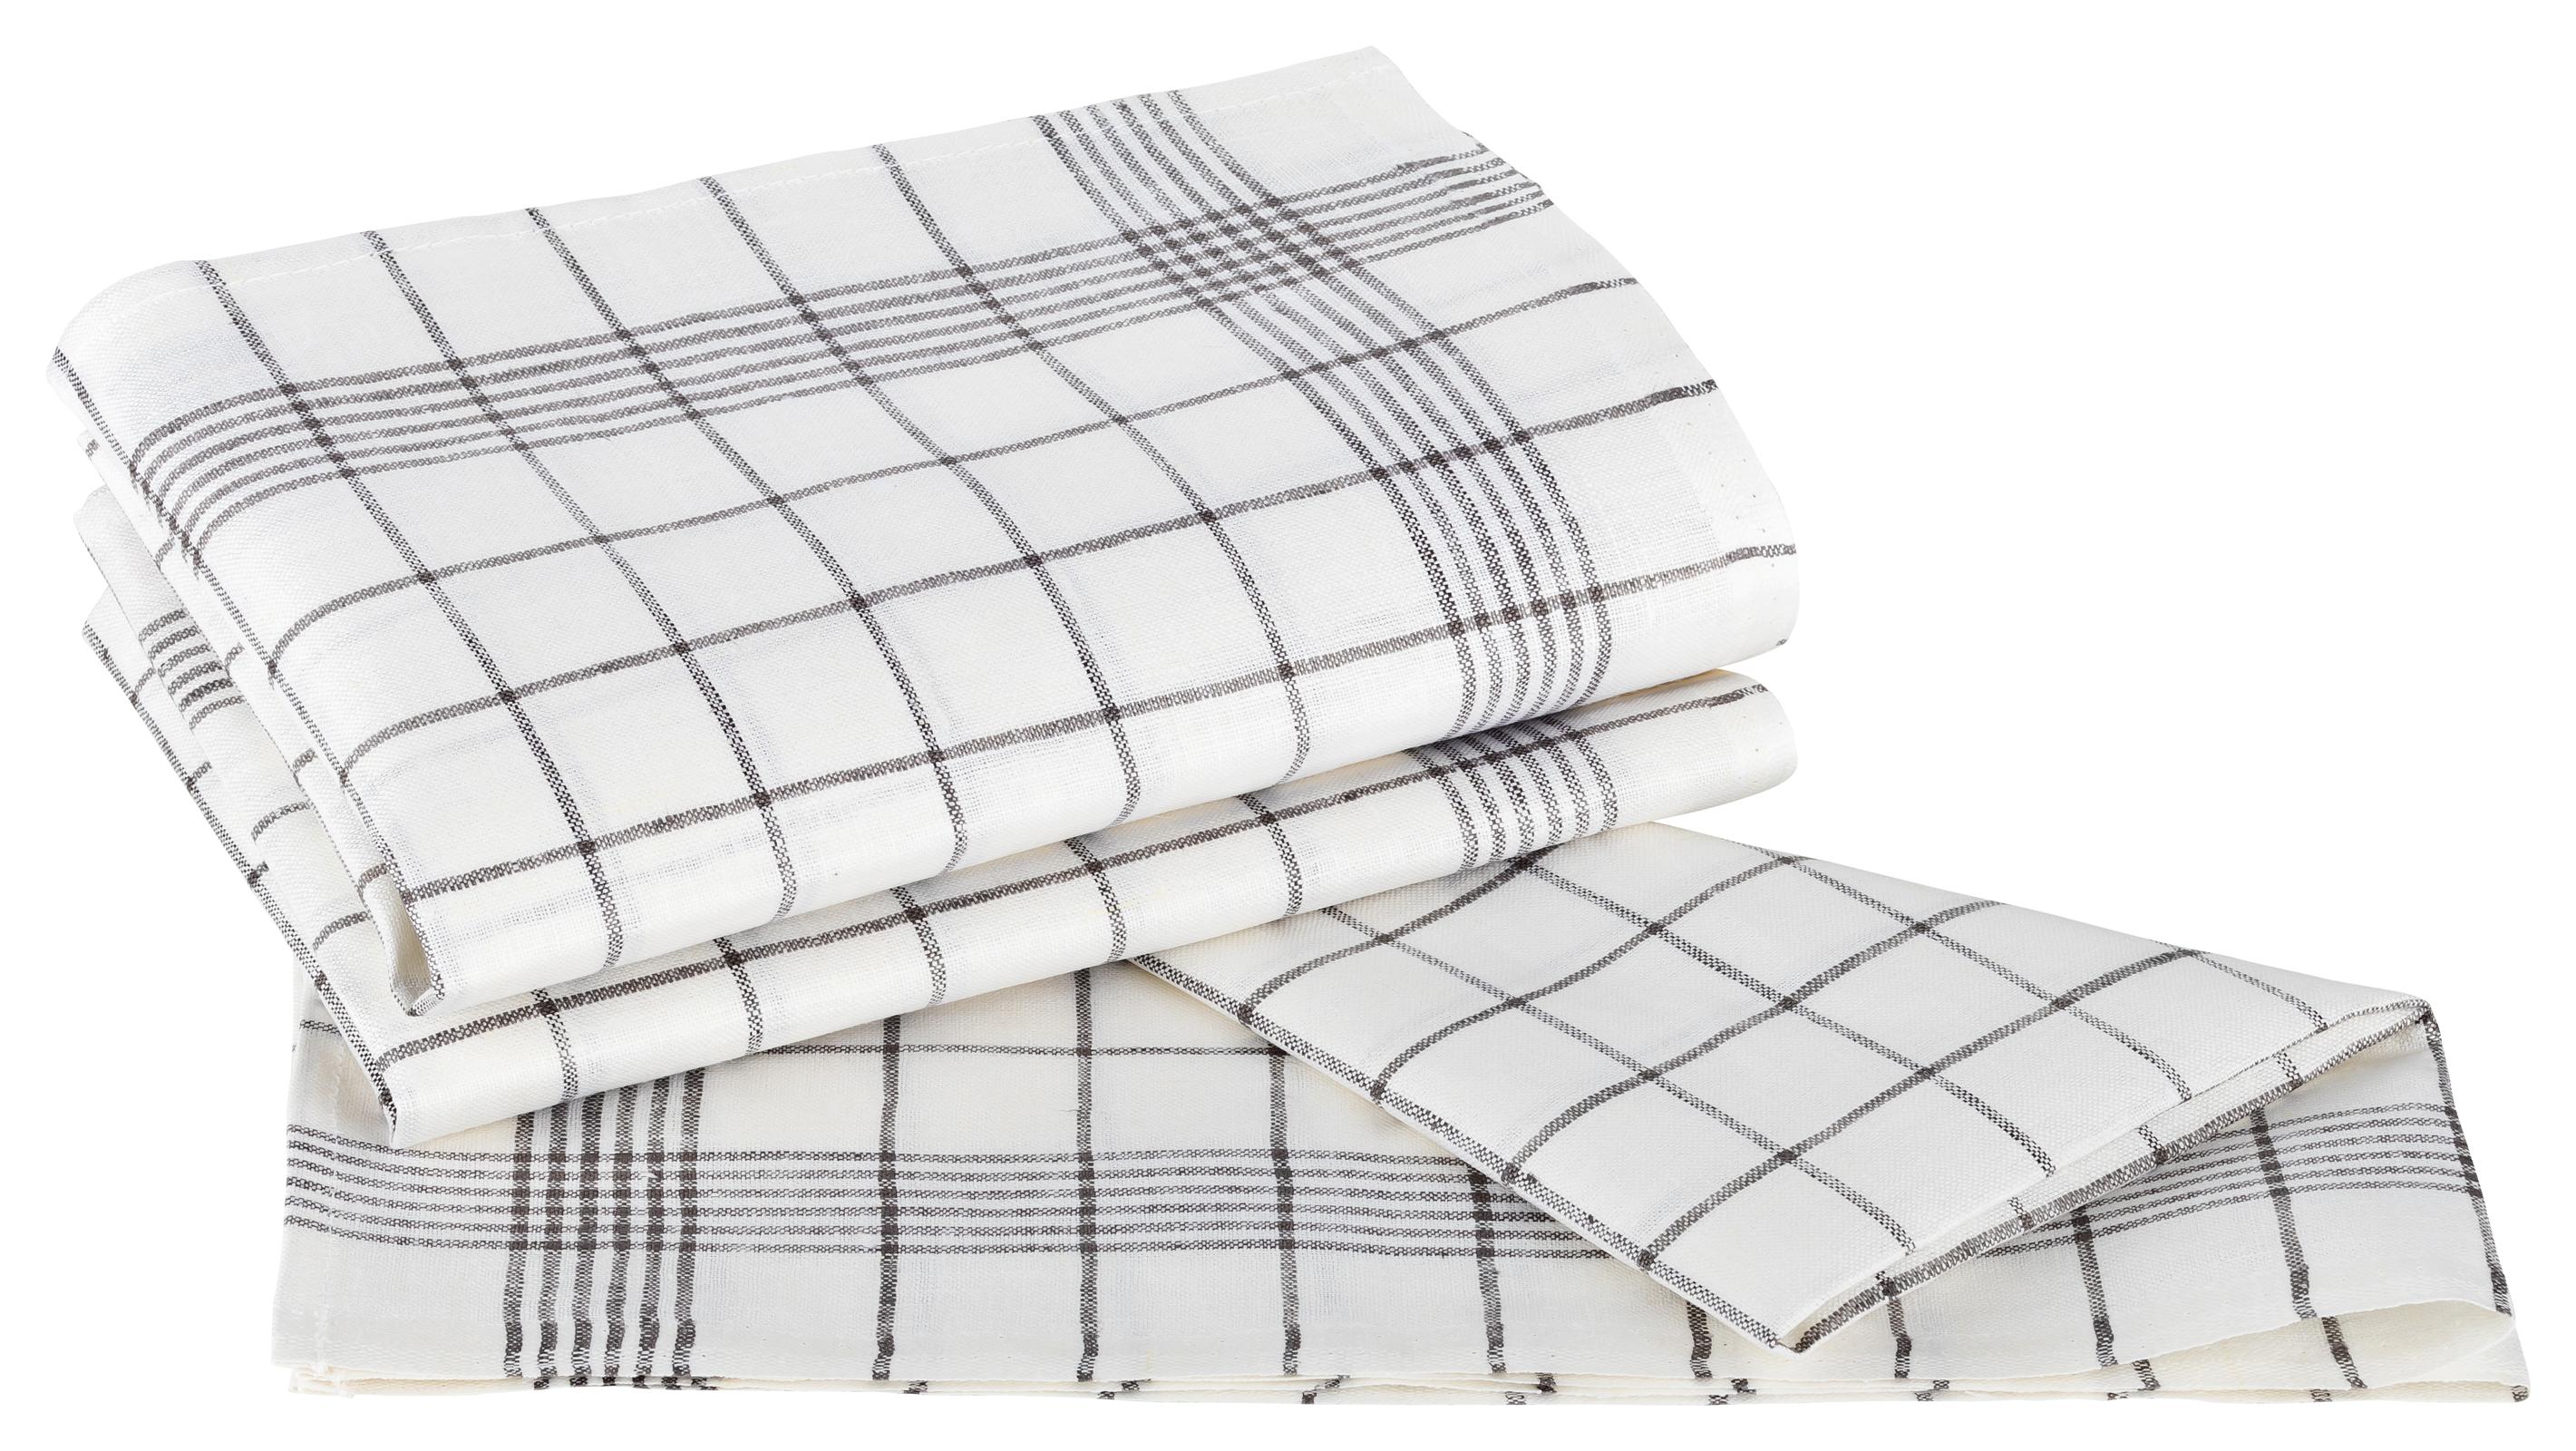 Küchentextilien - Kracht 3er Pack Geschirrtücher Gläsertücher Reinleinen 50x70 Karo 2 262 18 weiß grau  - Onlineshop PremiumShop321